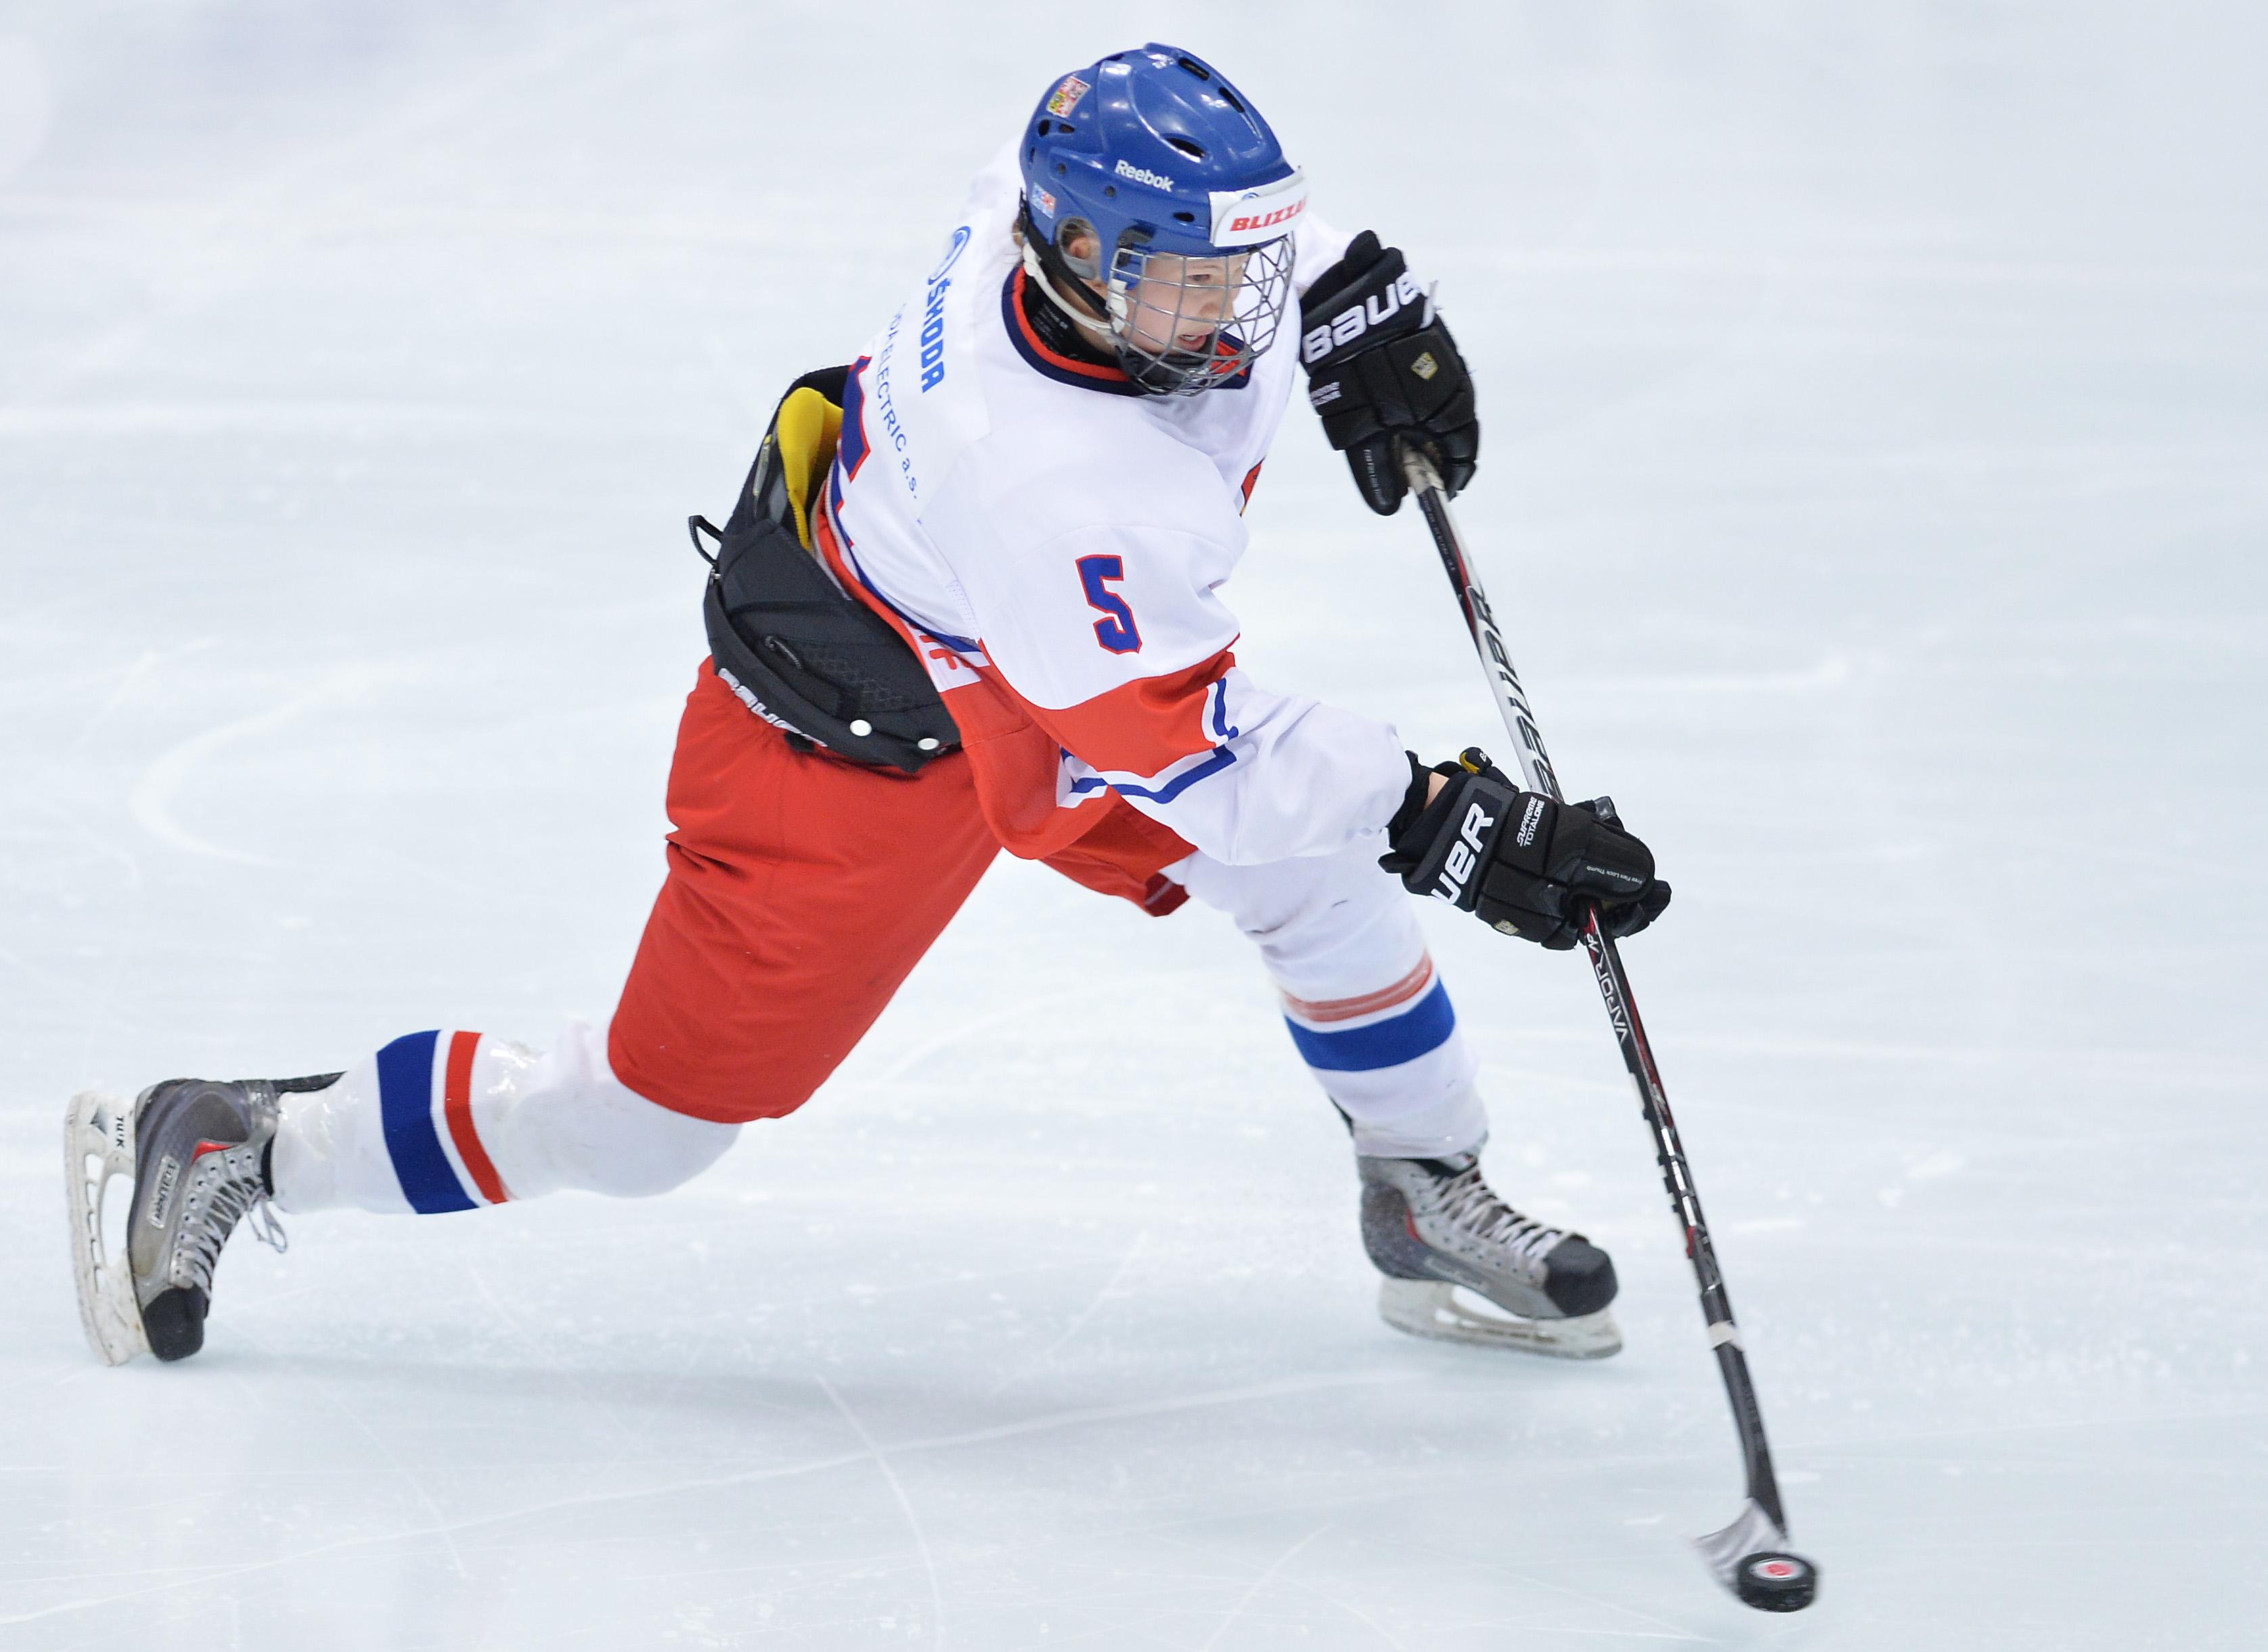 Ice Hockey Women's 5 Nations Tournament - Day 4